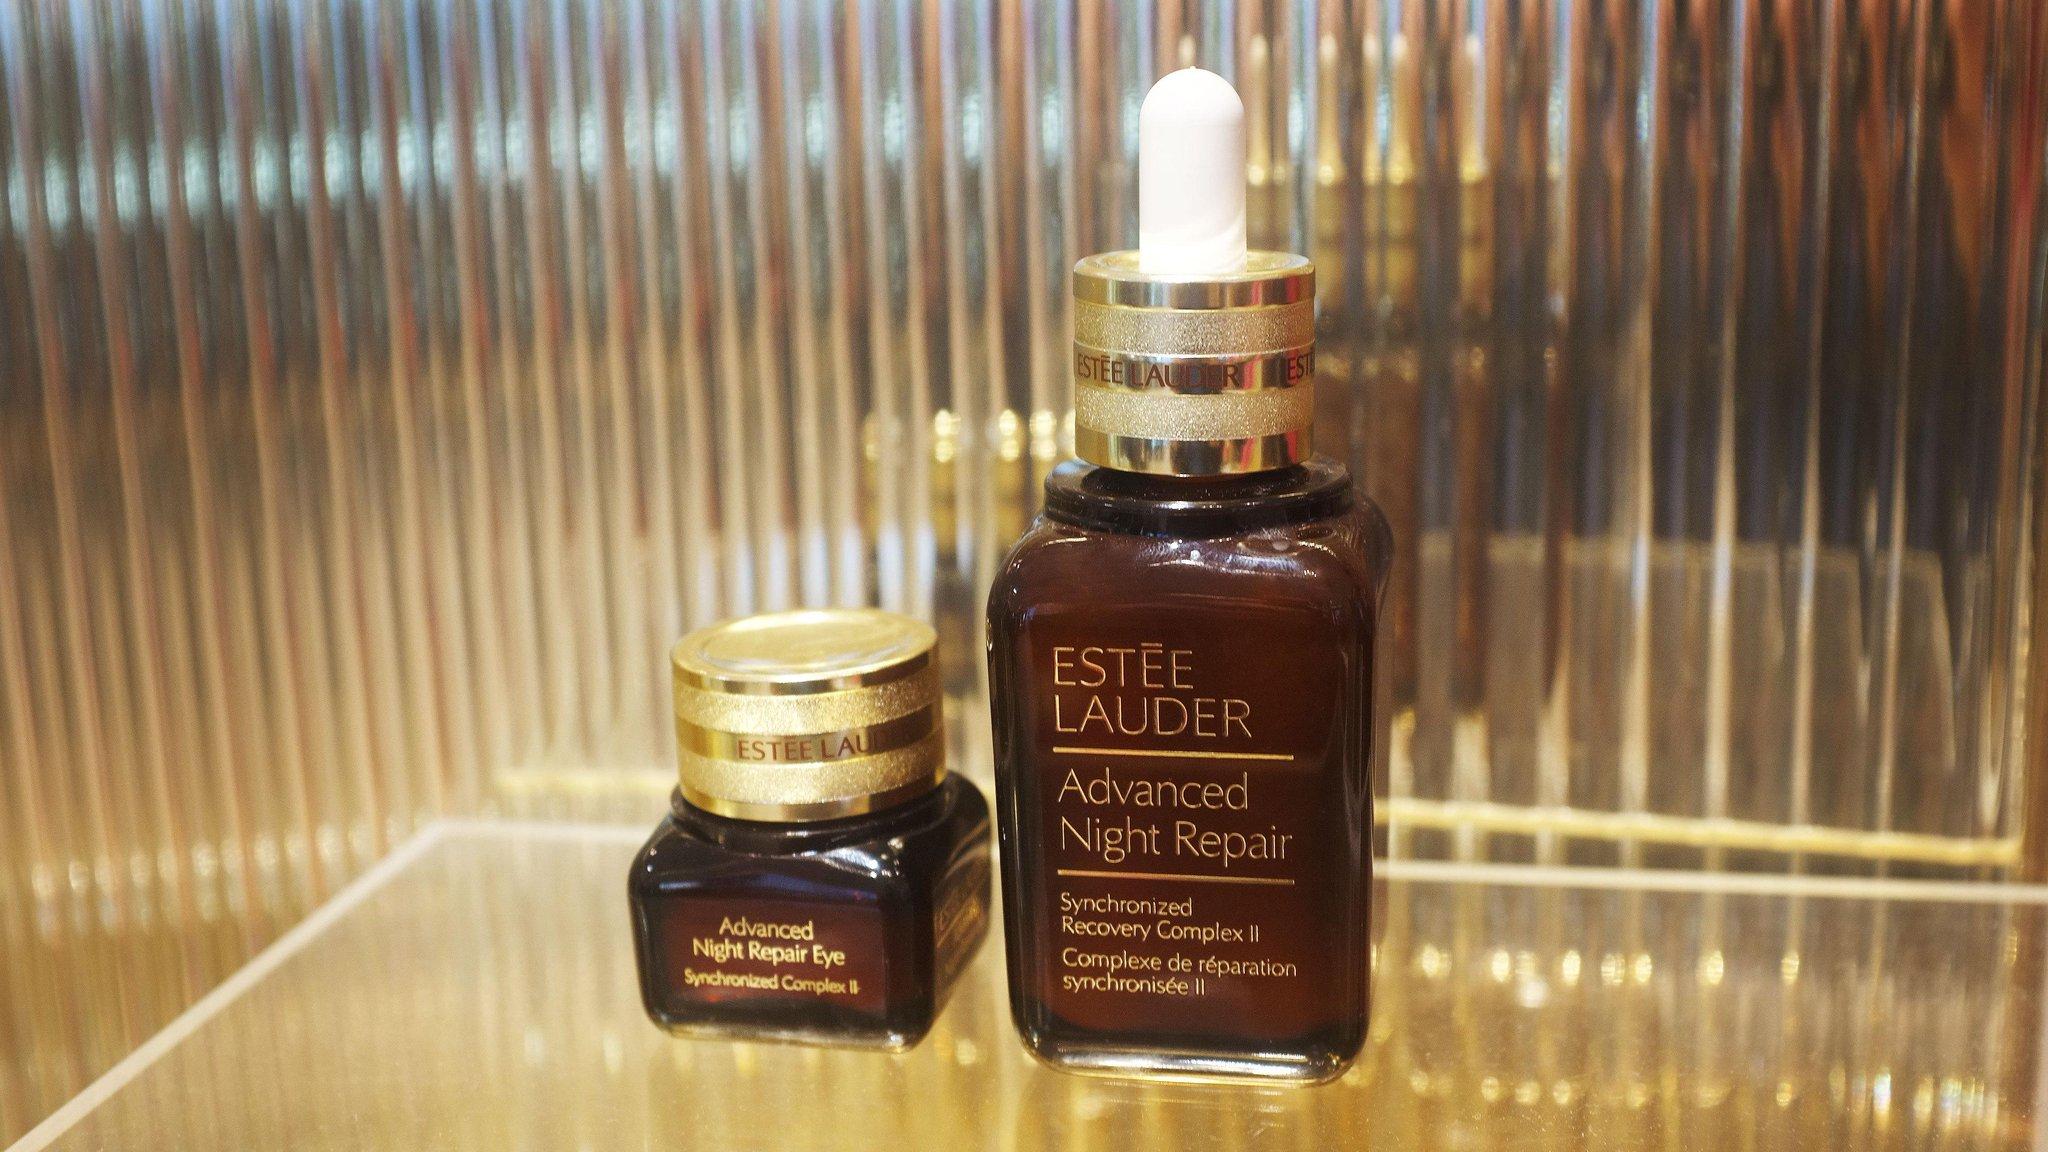 Did someone say free beauty treat? Snag a fab Estée Lauder full-size goodie & get glowing! http://t.co/0GtSzNOJ2w http://t.co/KnPhPsyKz9